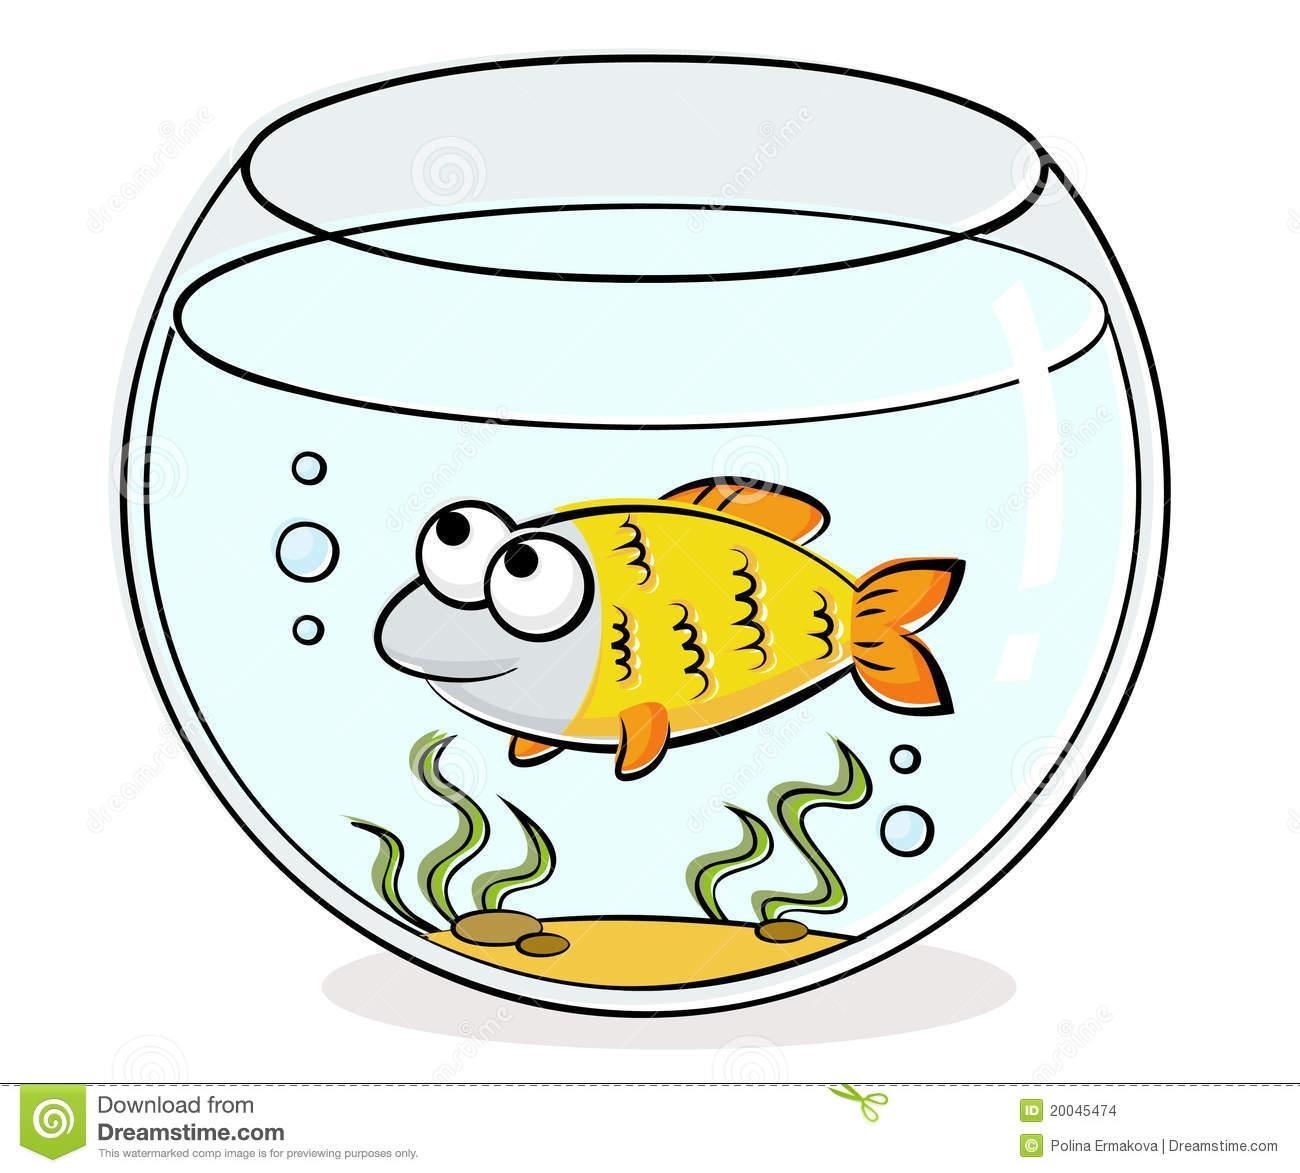 Fishtank clipart #2, Download drawings